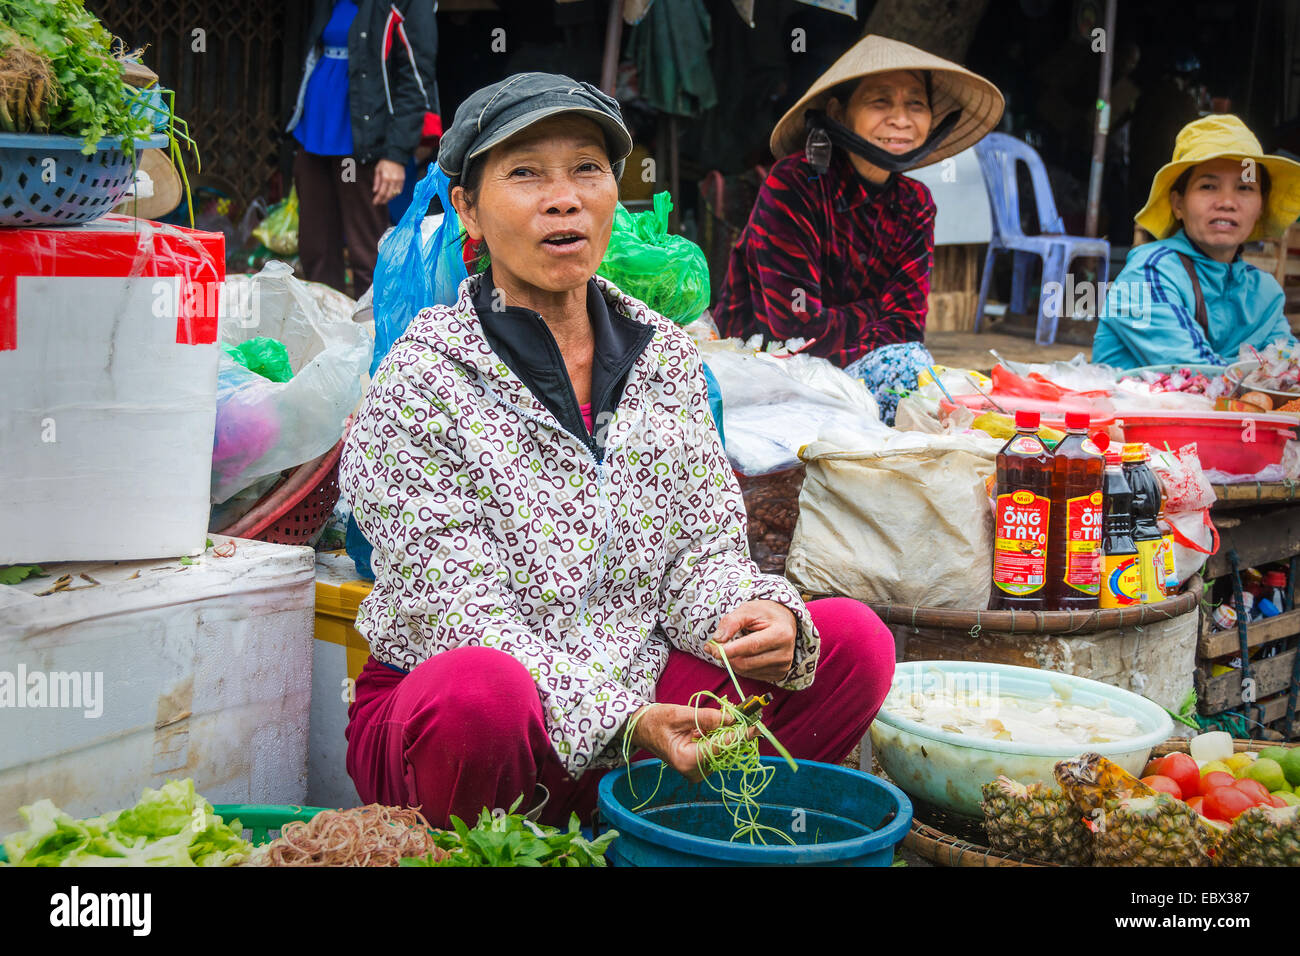 South East Asian woman market trader laughing at the camera. Market in Danang Vietnam - Stock Image